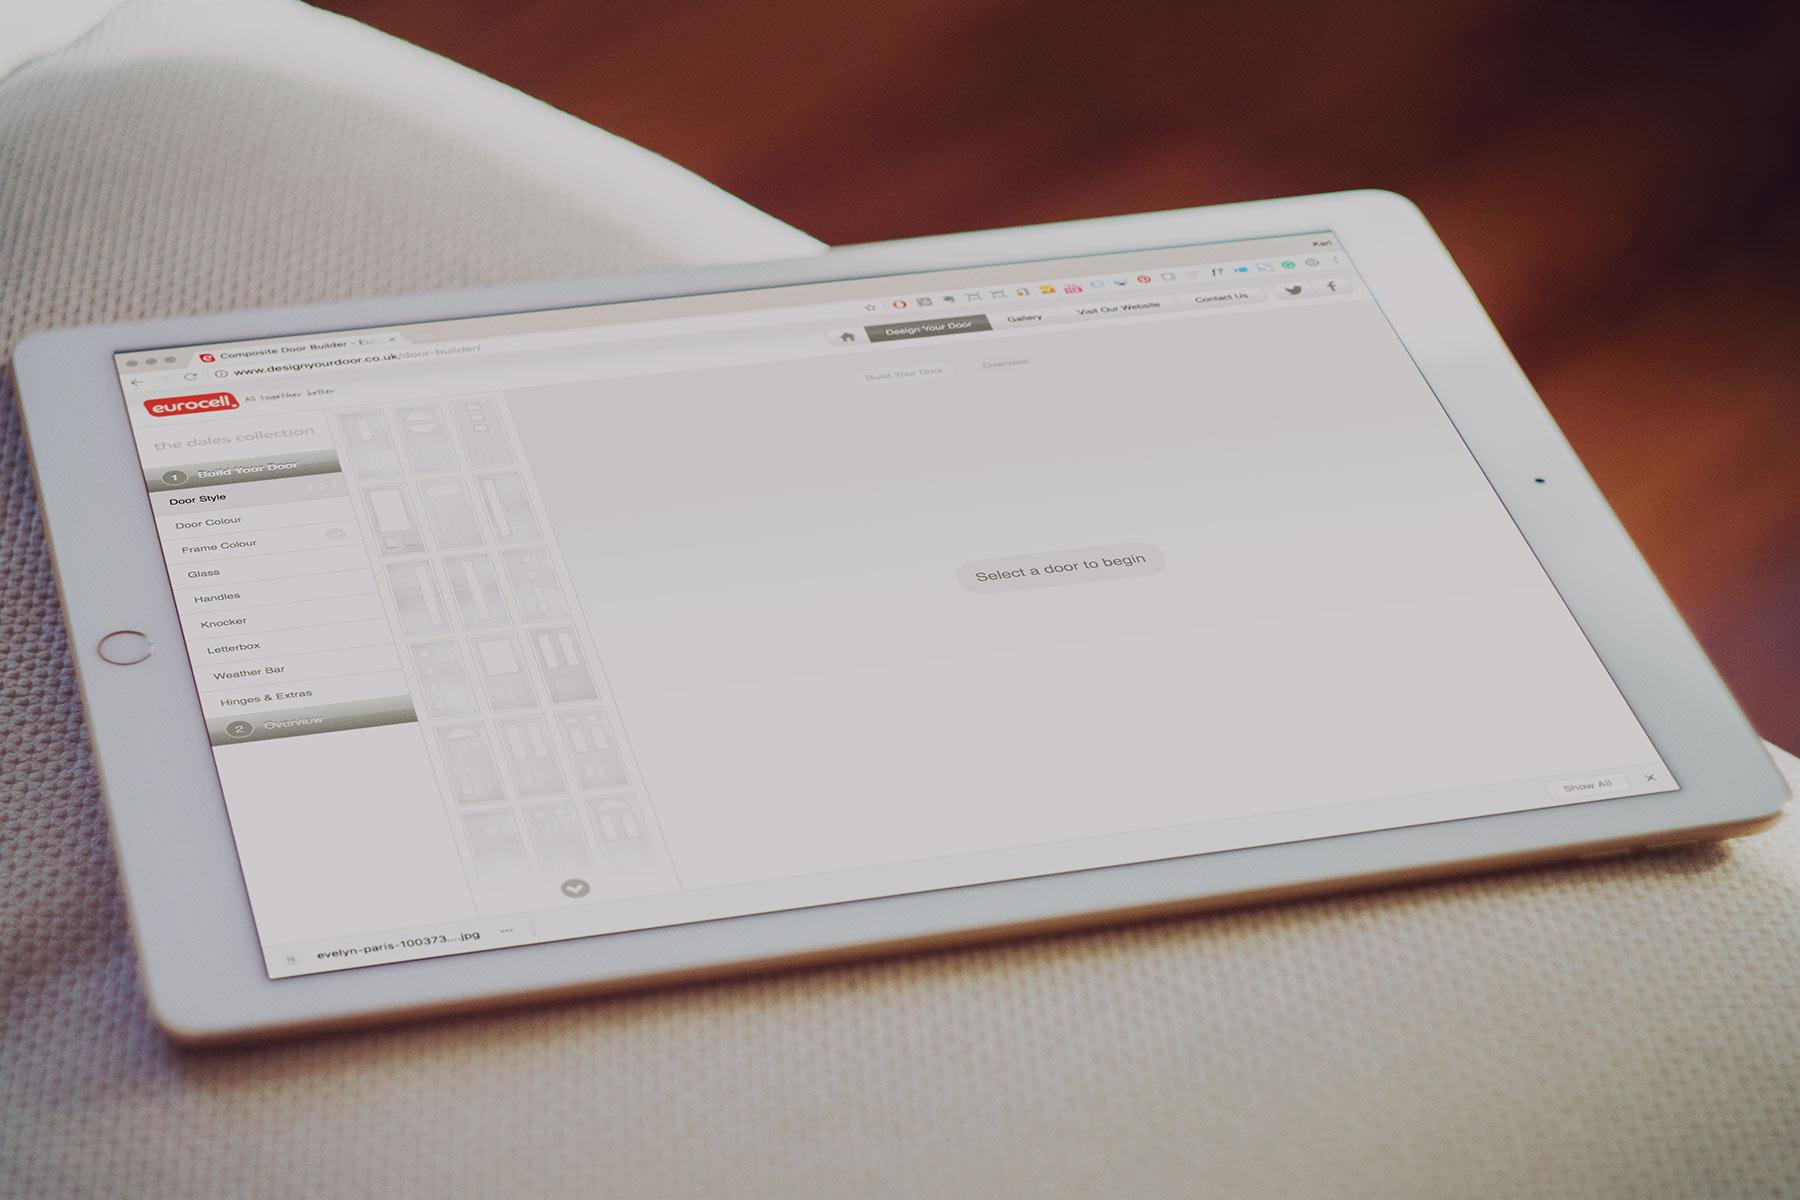 Eurocell PLC Configurator  - Start Screen